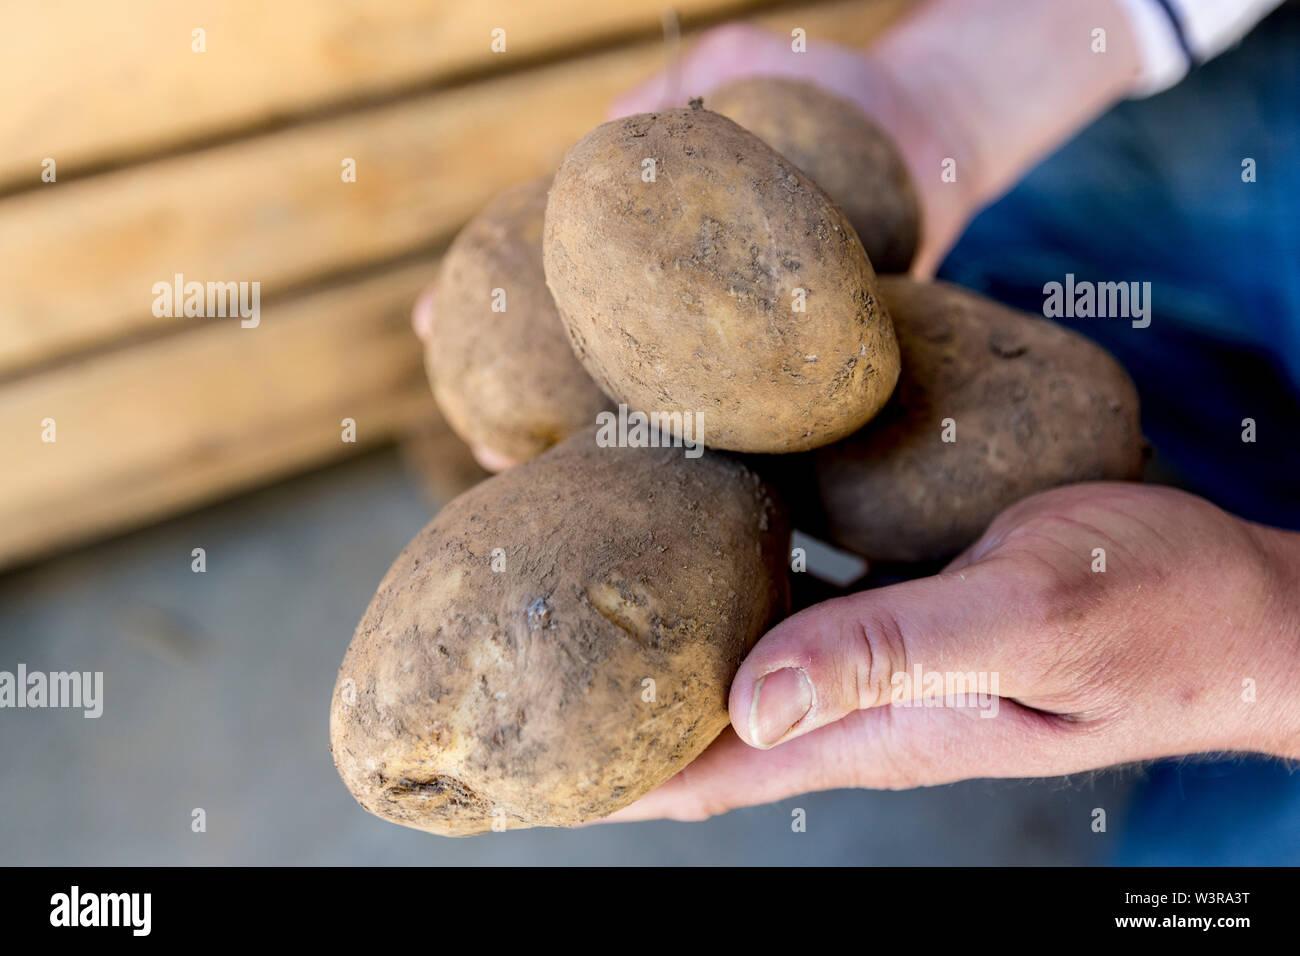 Pembrokeshire grown Maris Piper Potatoes. ©James Davies Photography - Stock Image